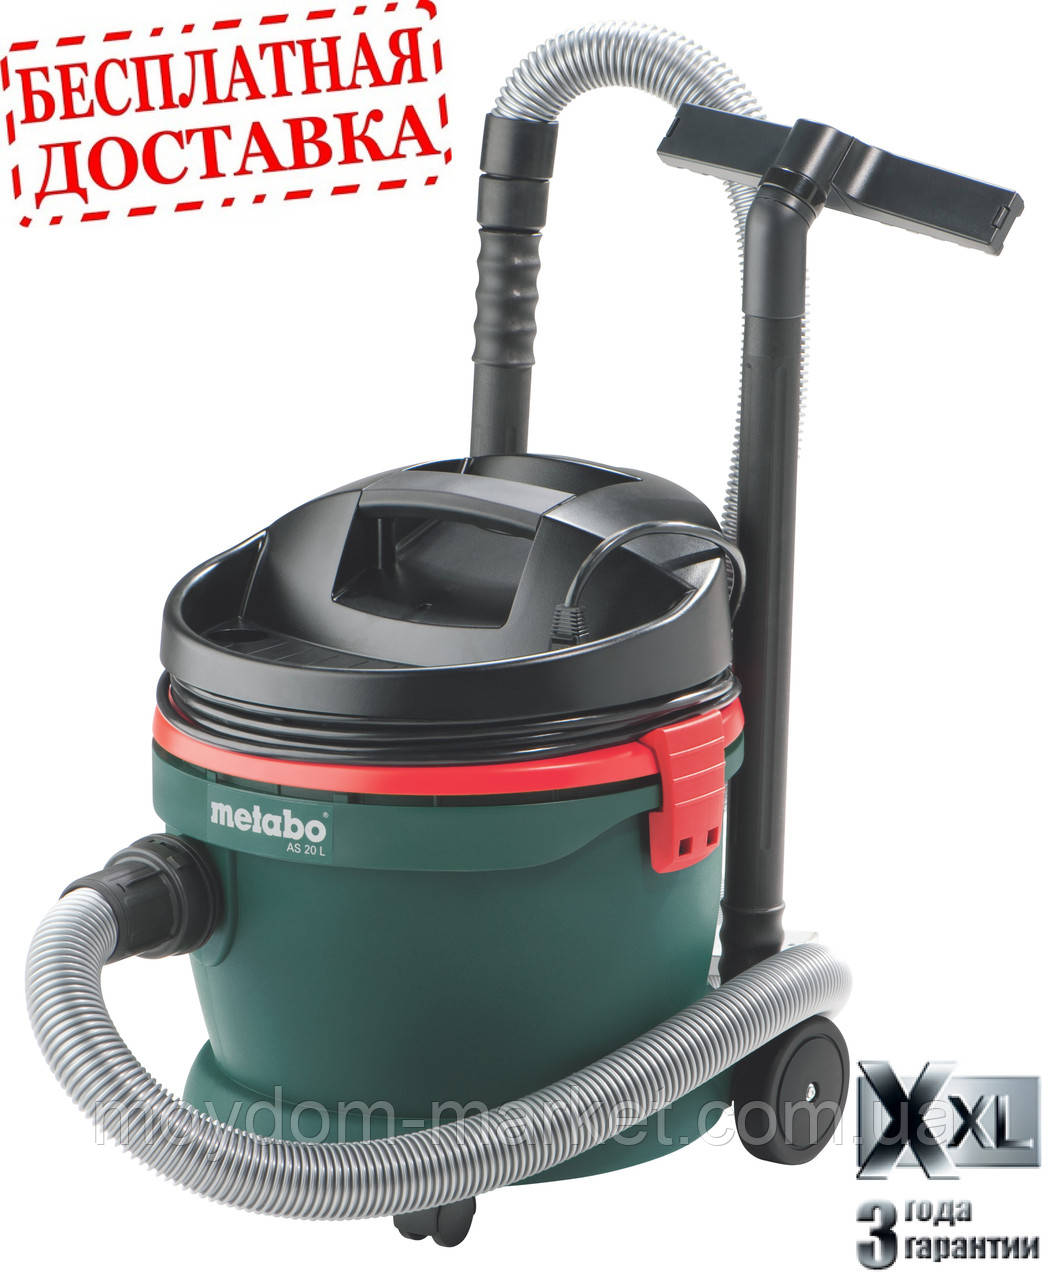 Пилосос Metabo AS20L 1,2кВт/ 602012000